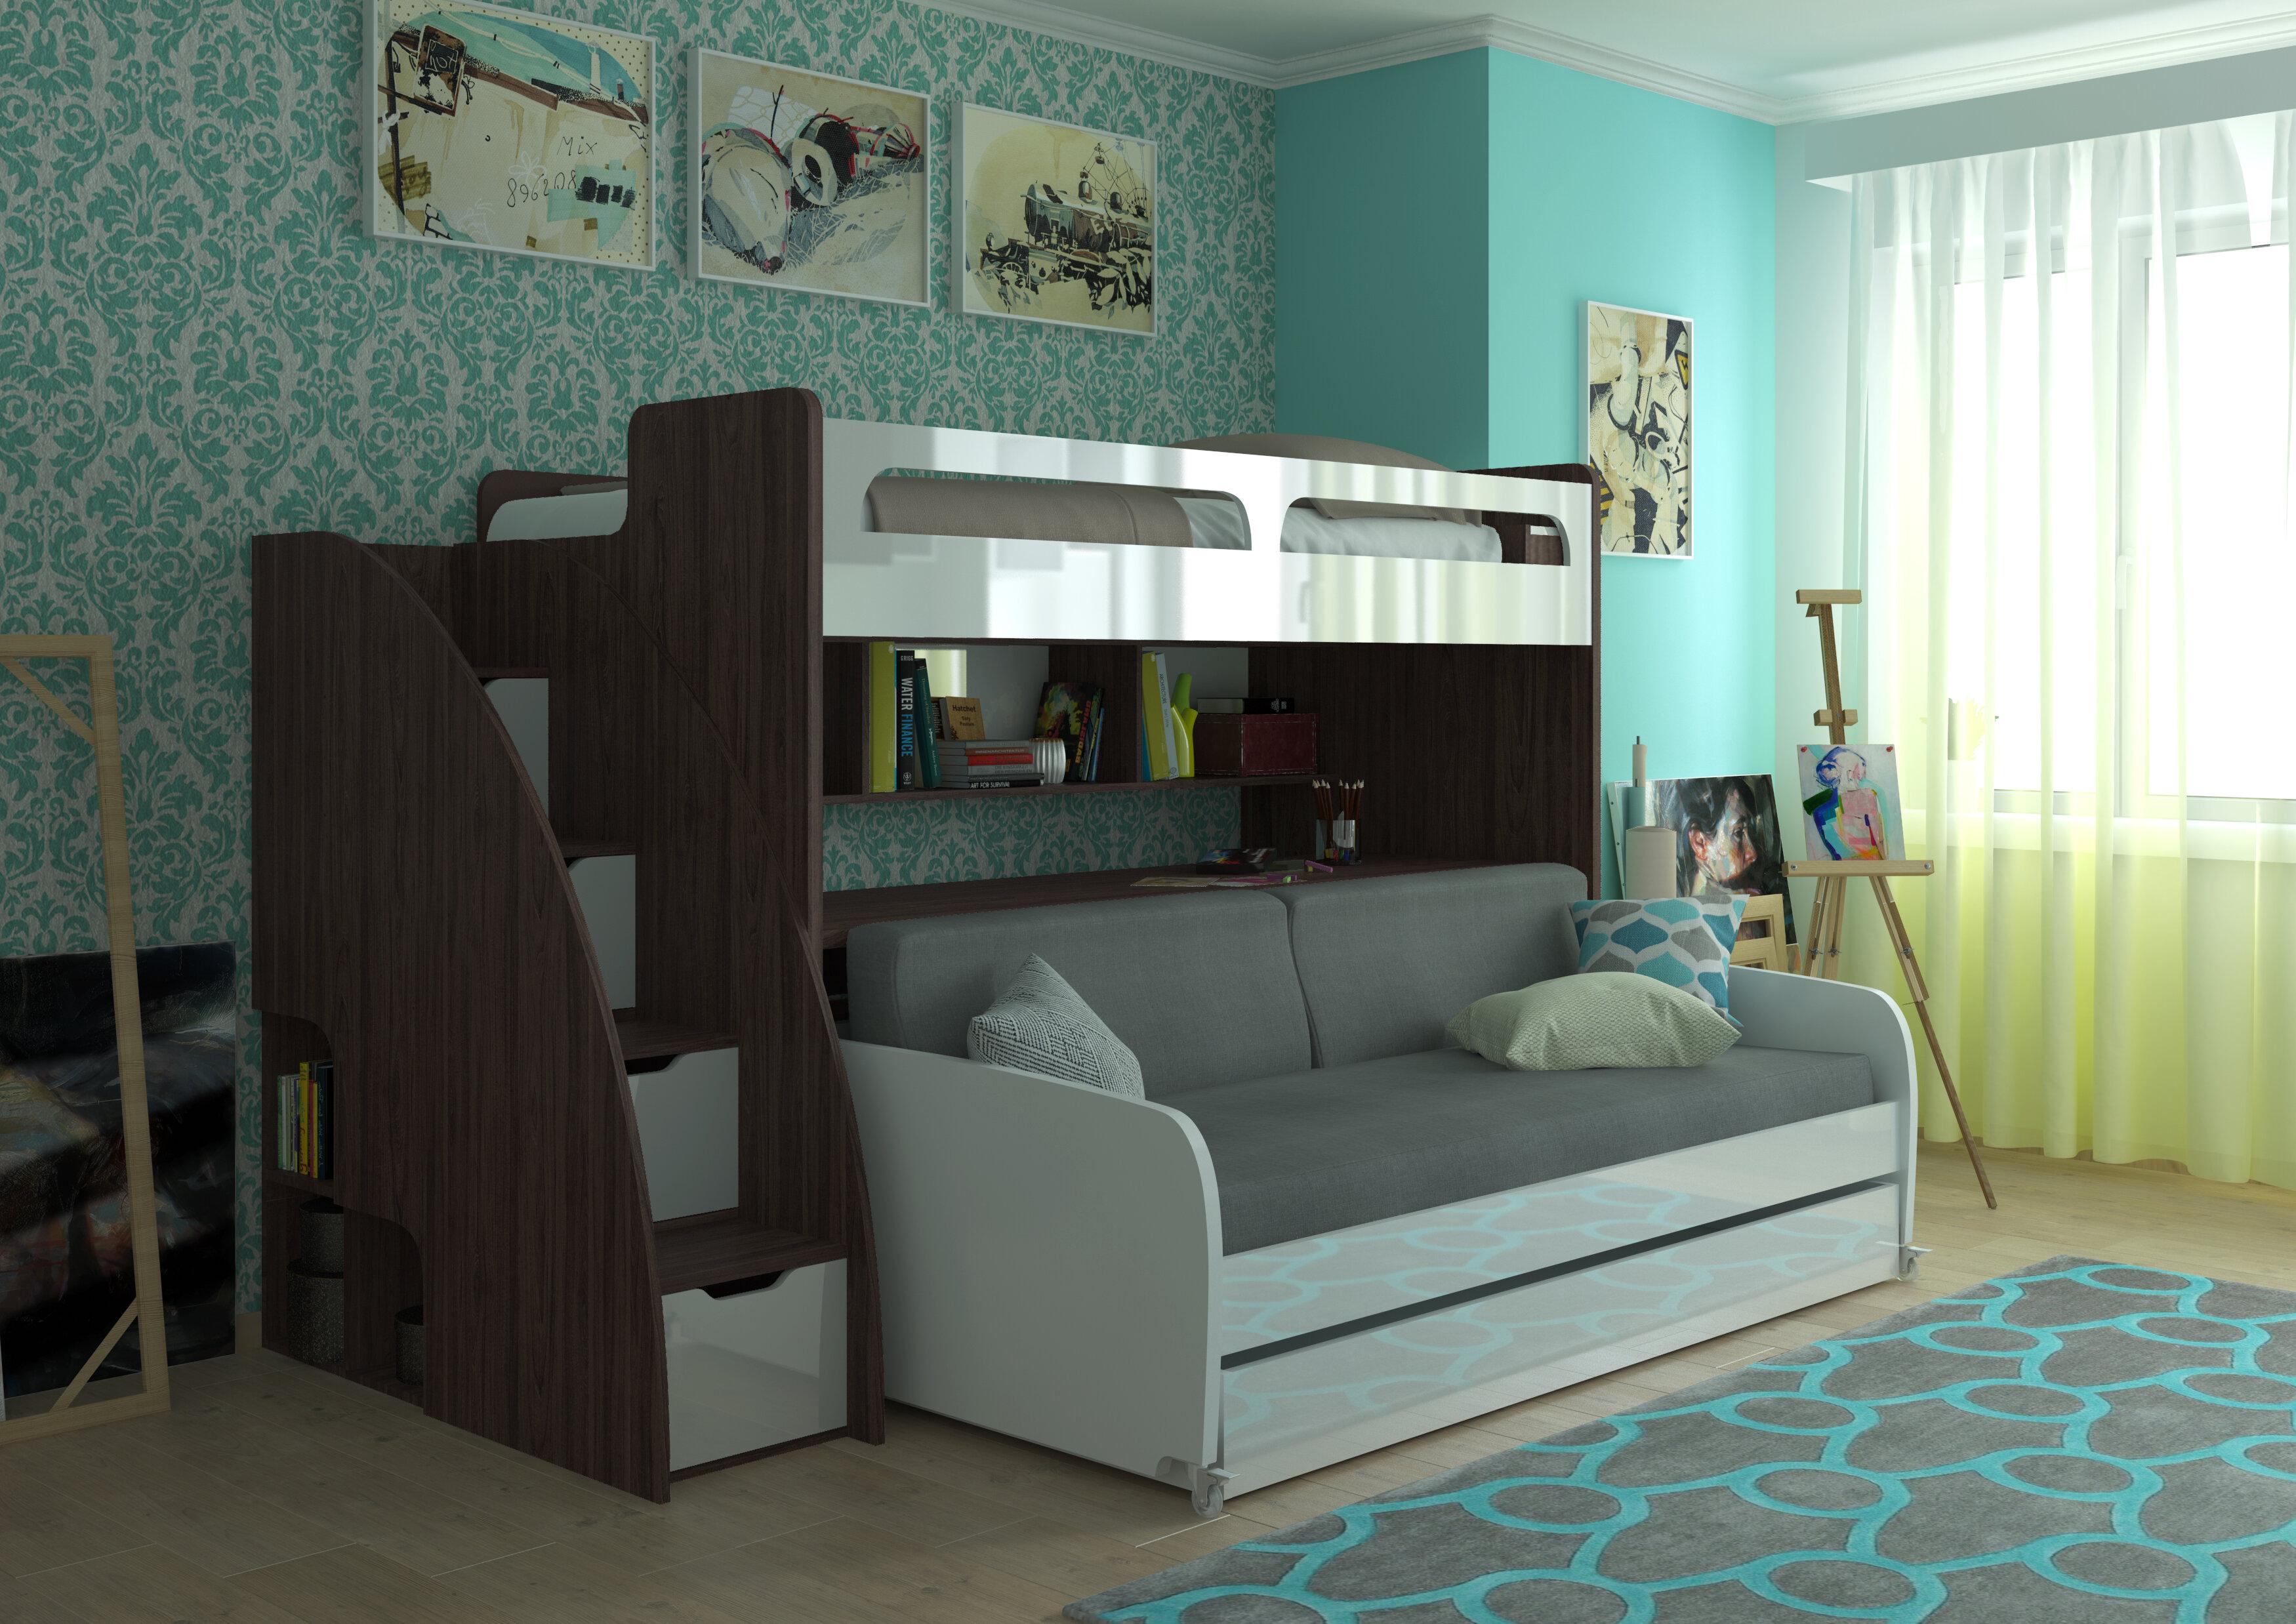 wayfair futon rae viv full sanders over bed futons kids baby reviews twin bunk pdx